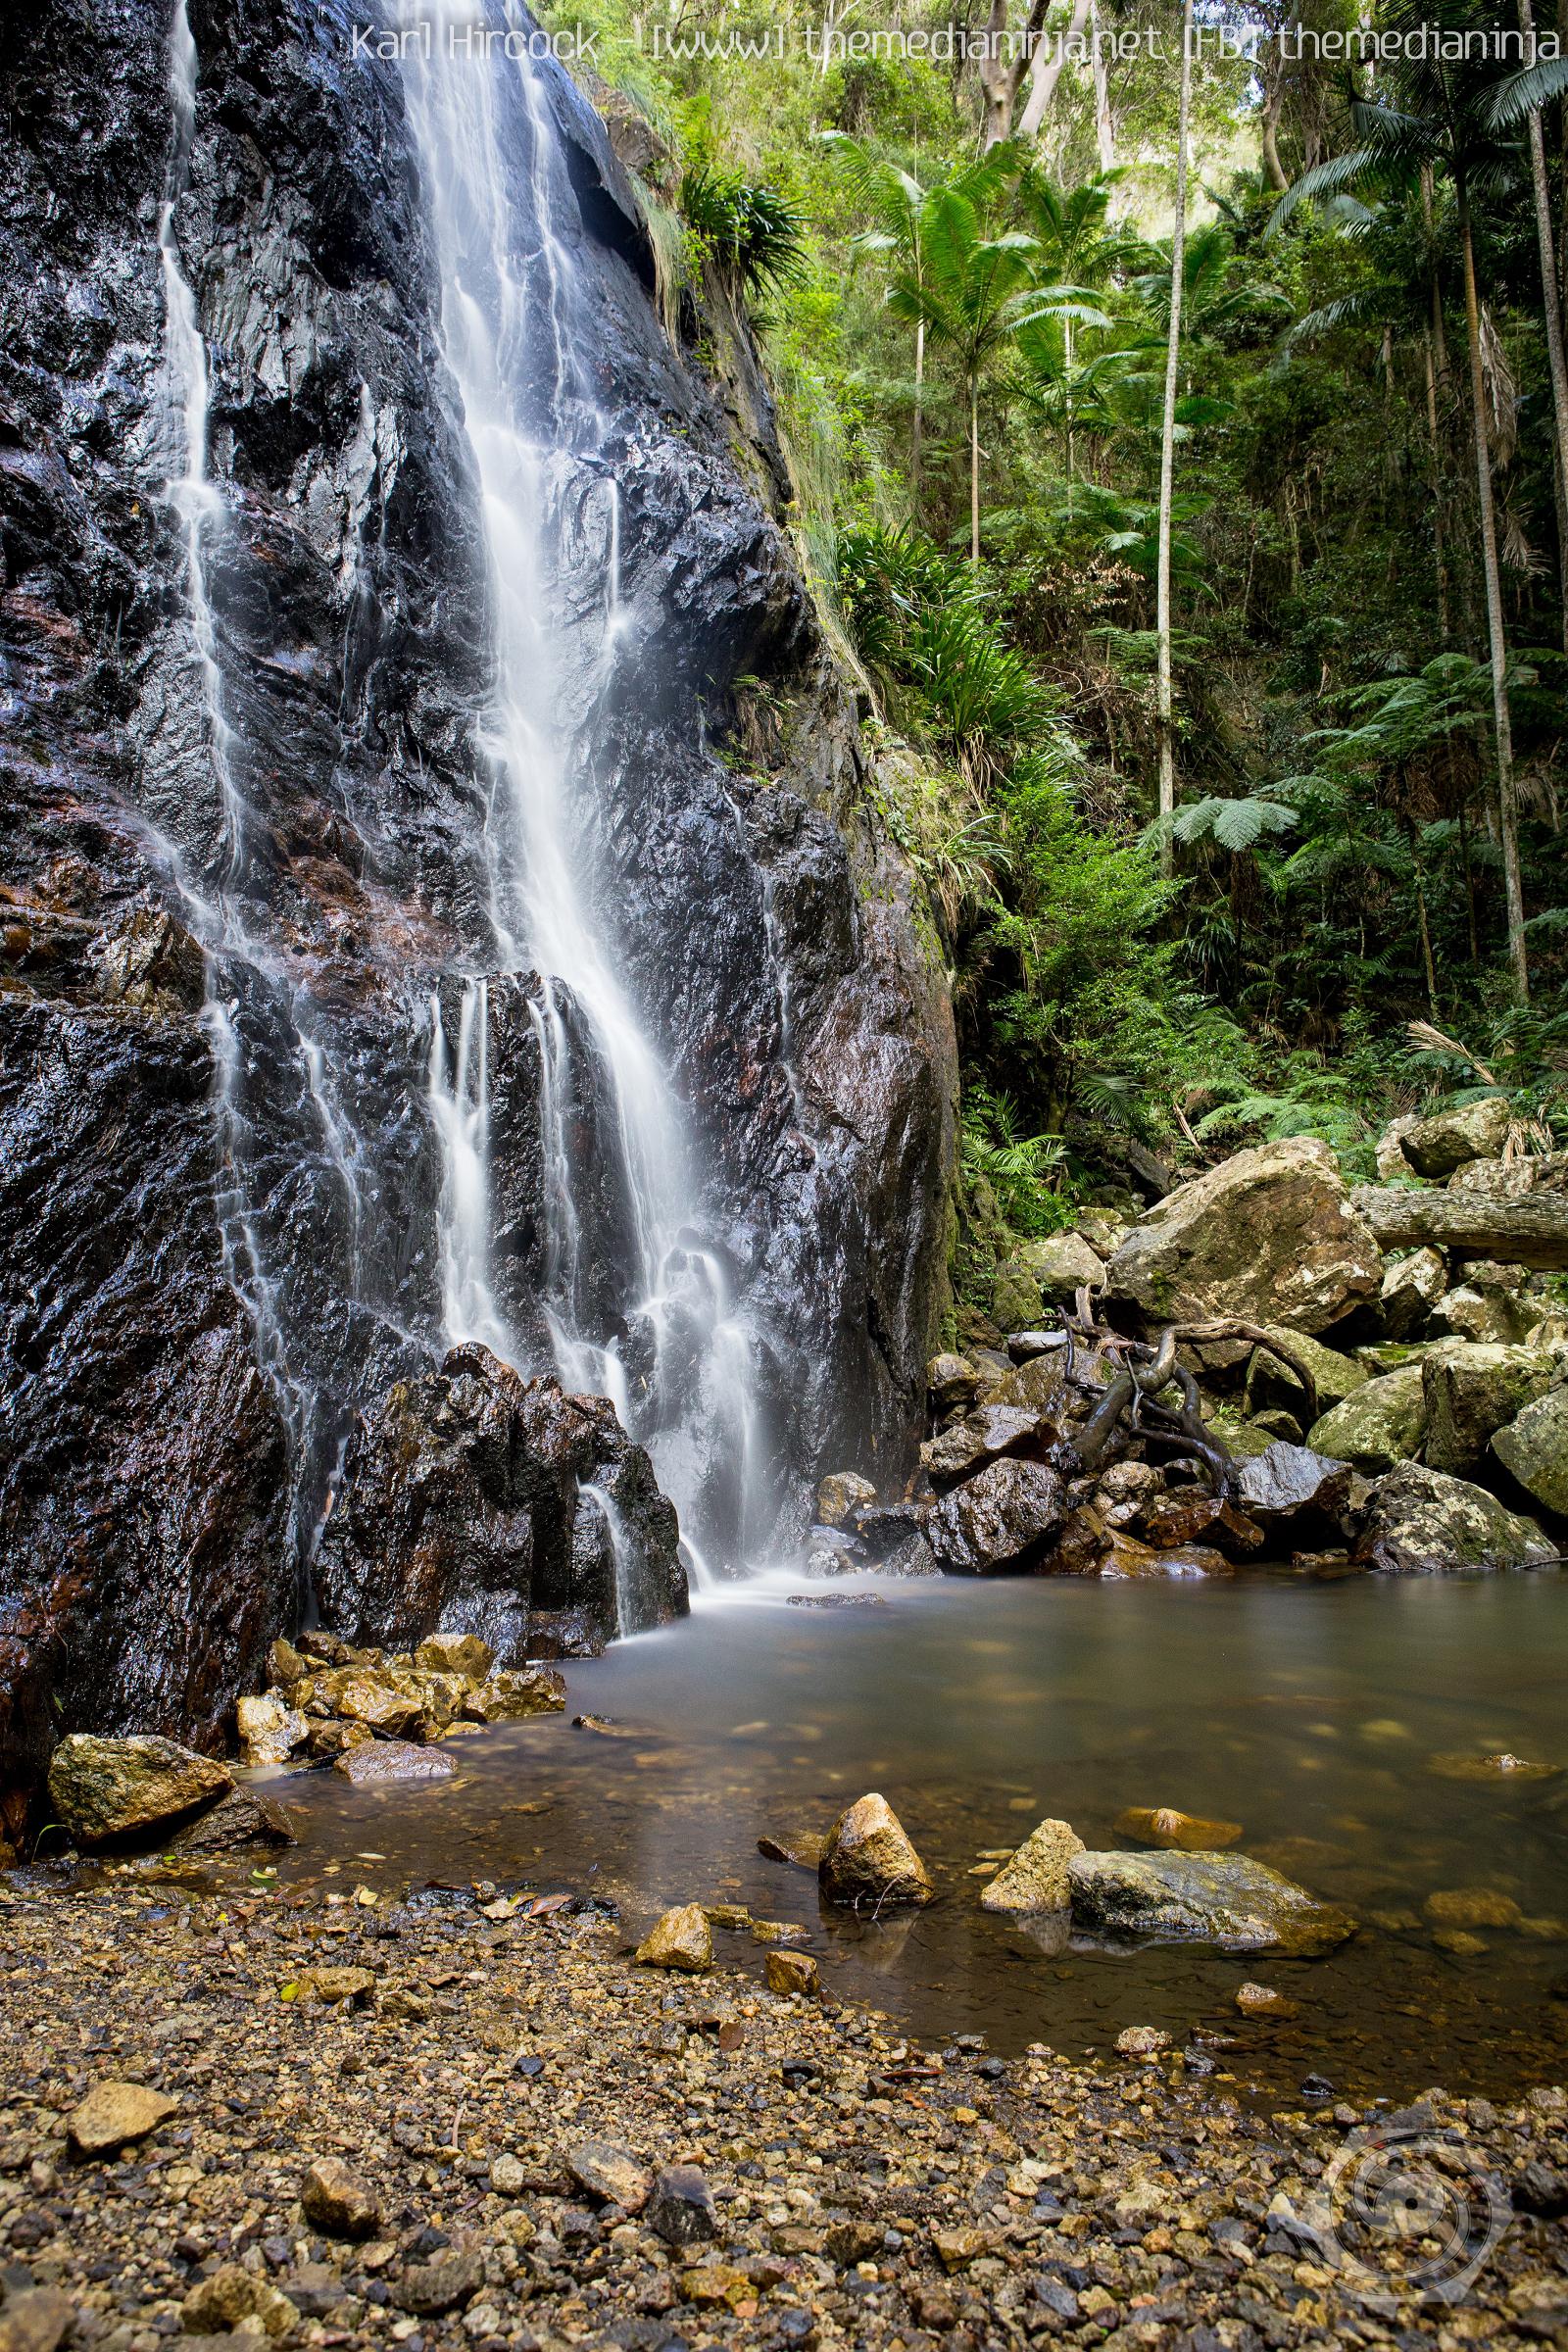 Ballenjiu falls